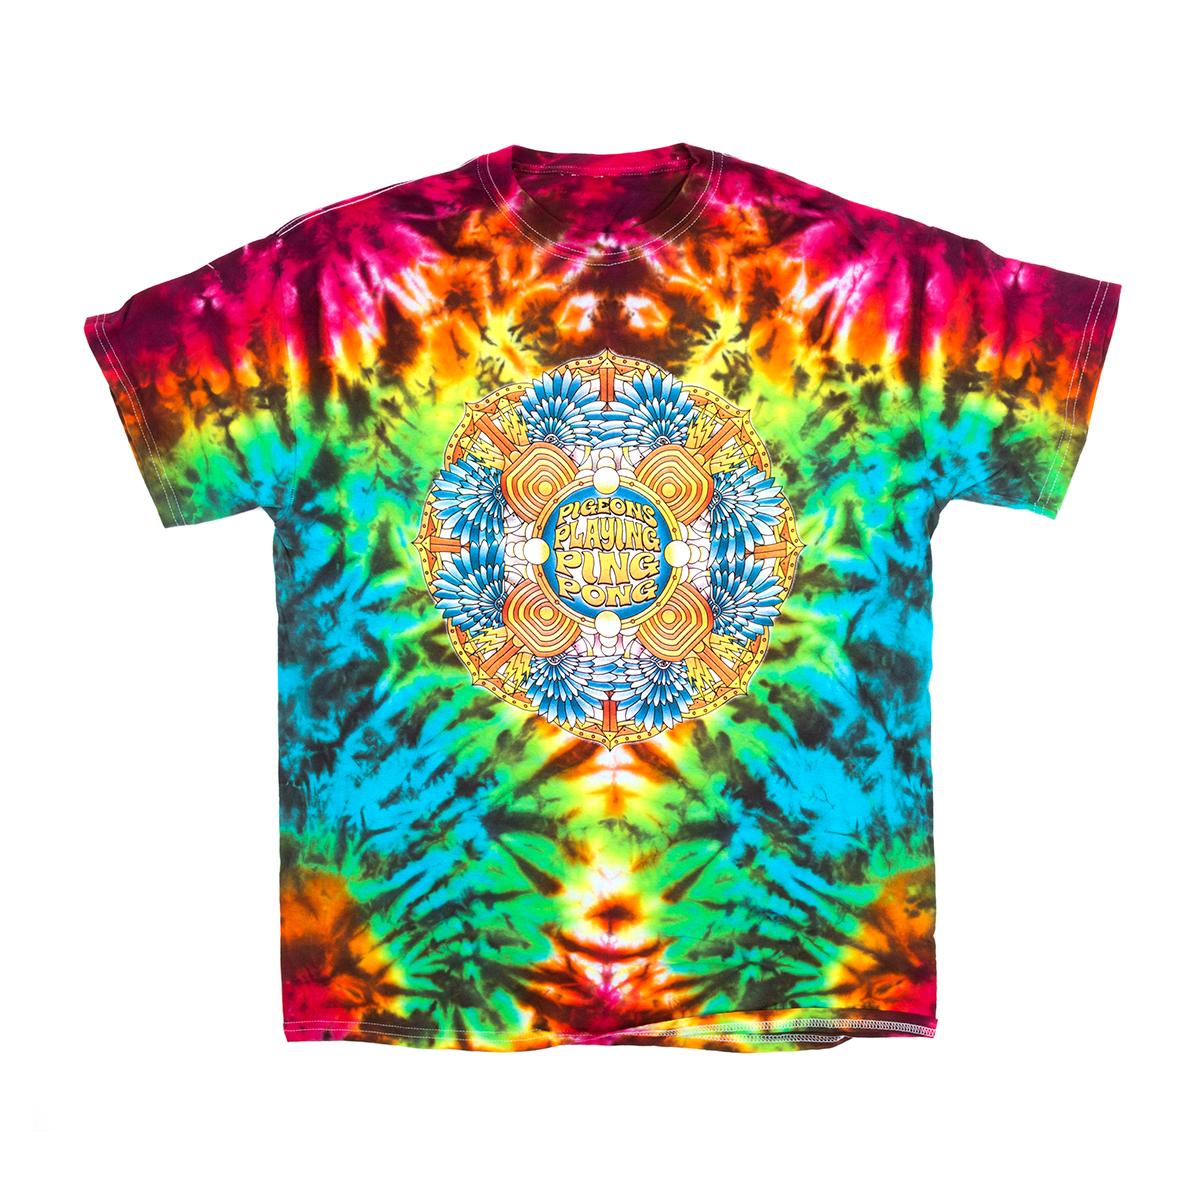 Mandala Rainbow Tie Dye T-shirt